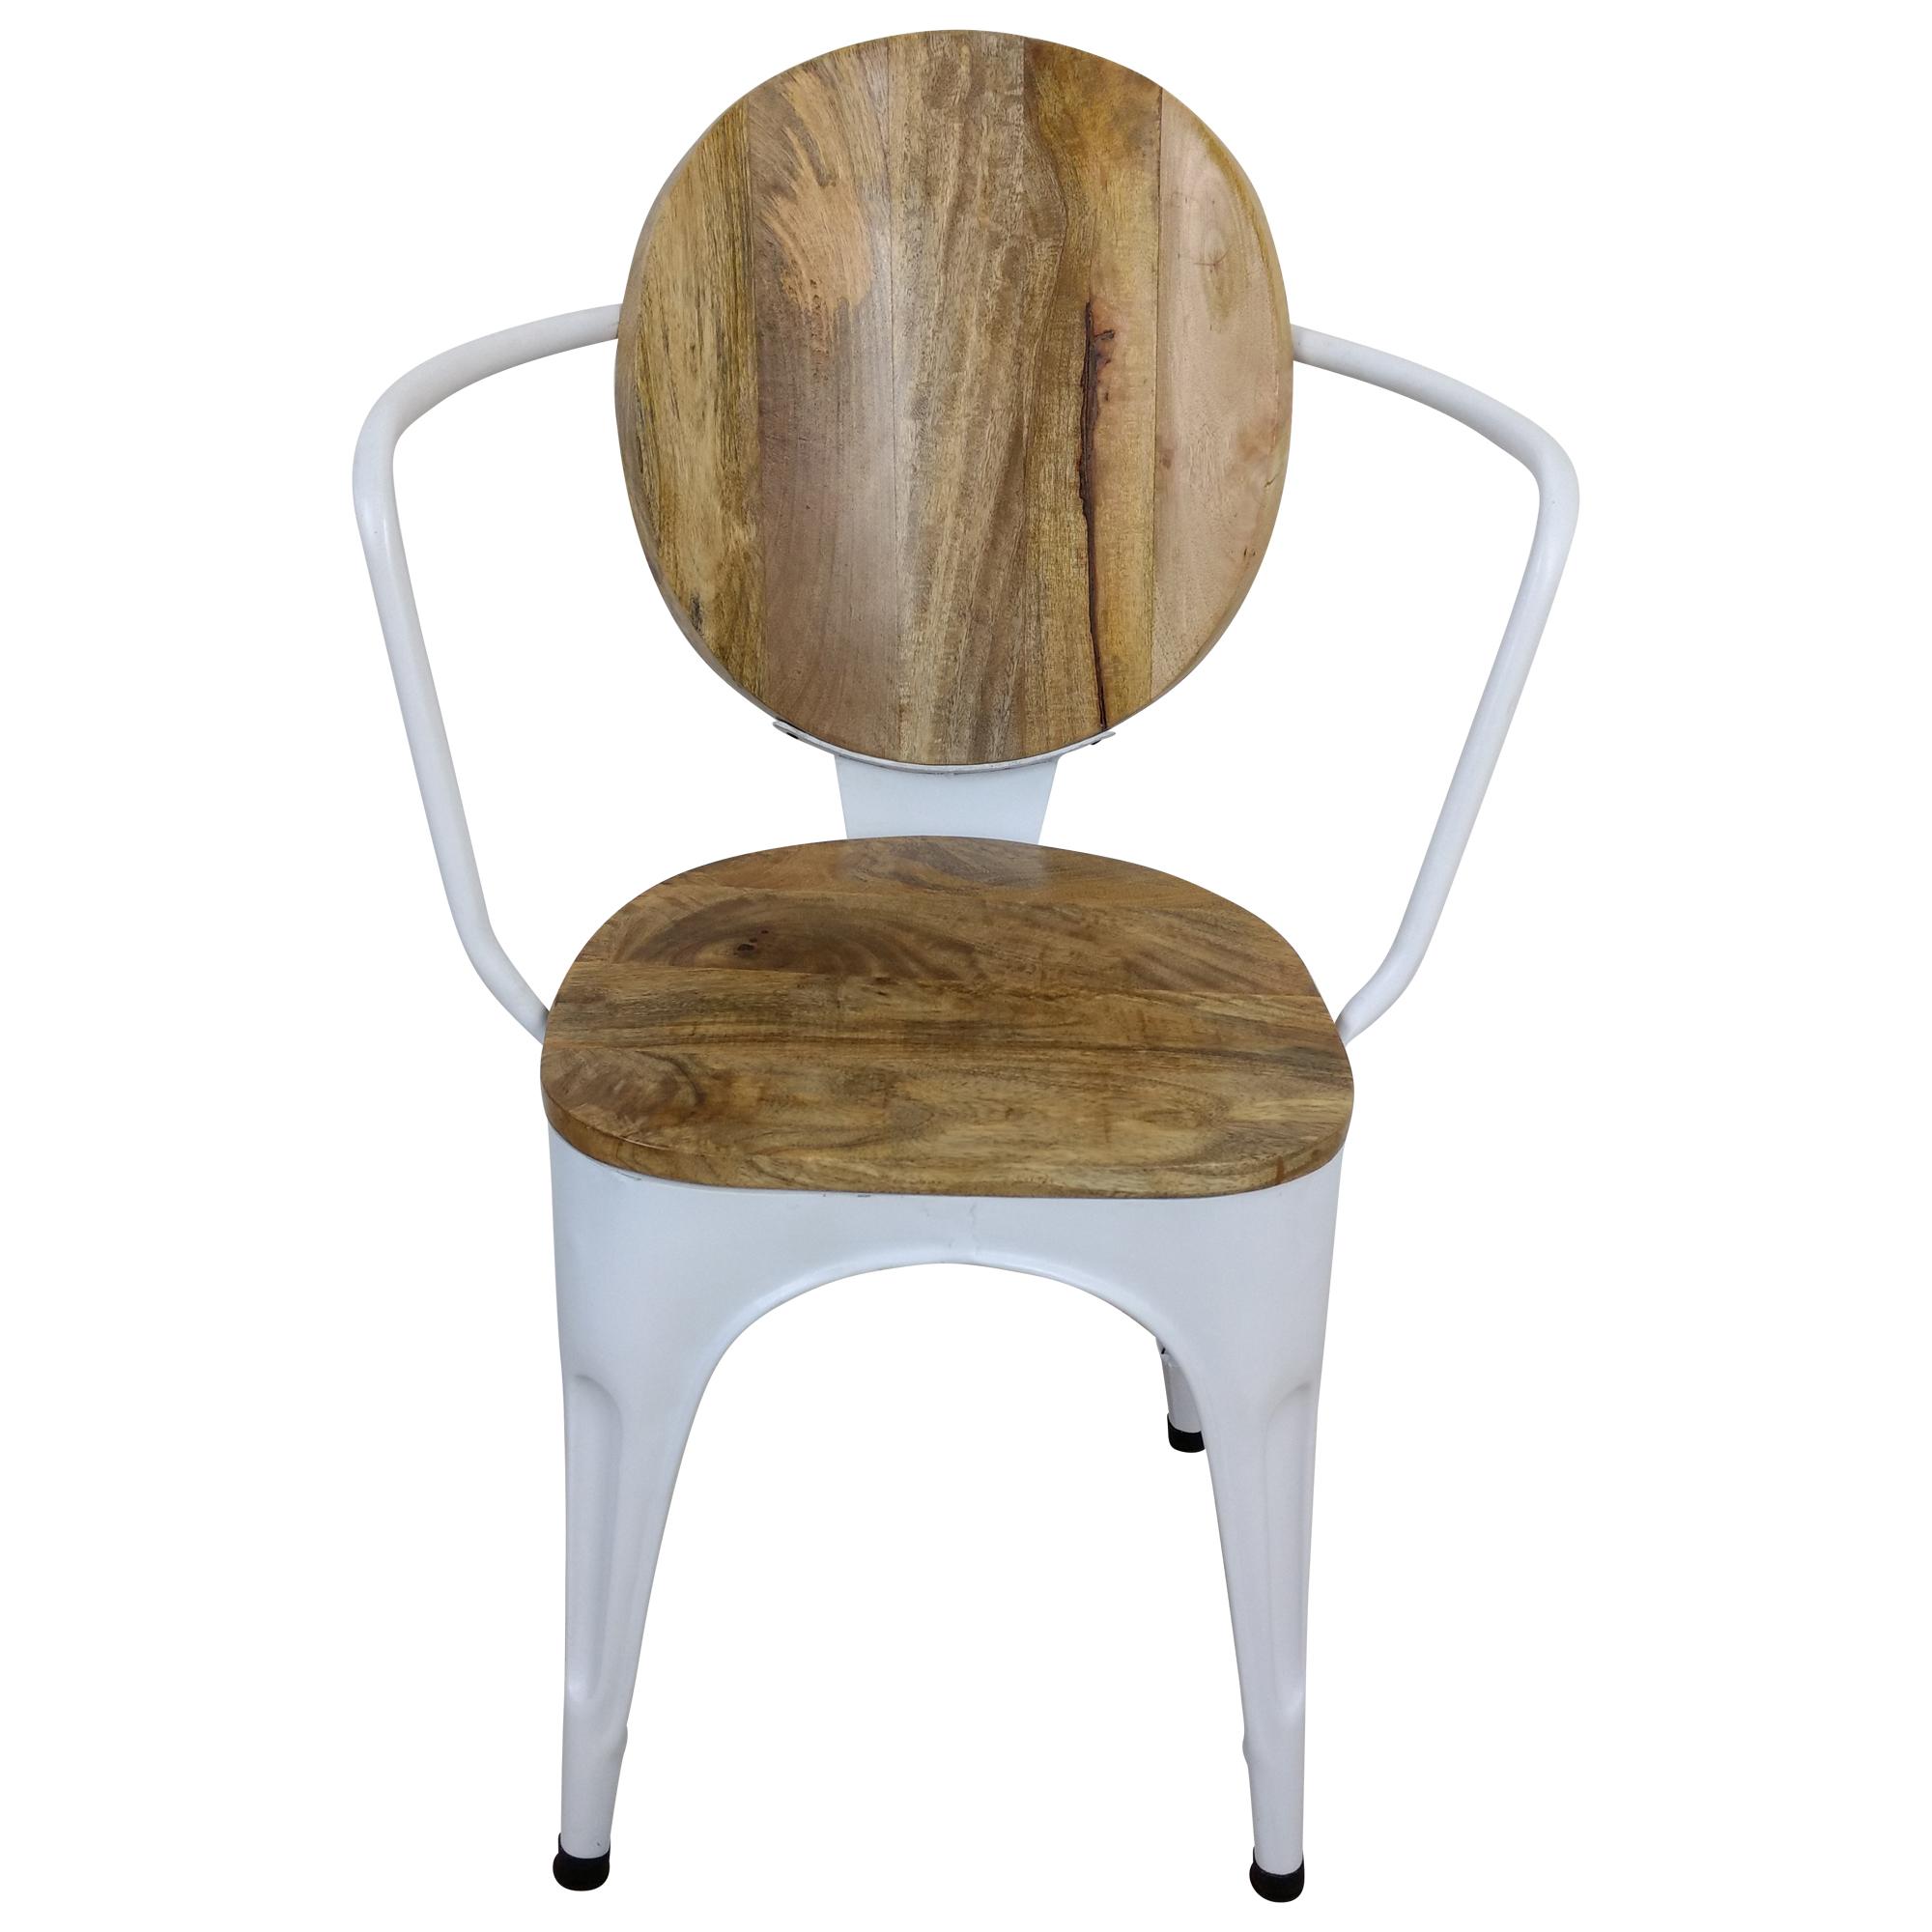 Esszimmerstuhl Industrie Stuhl Weiß Art Design Massivholz Handarbeit Industrial Rcj354LqA